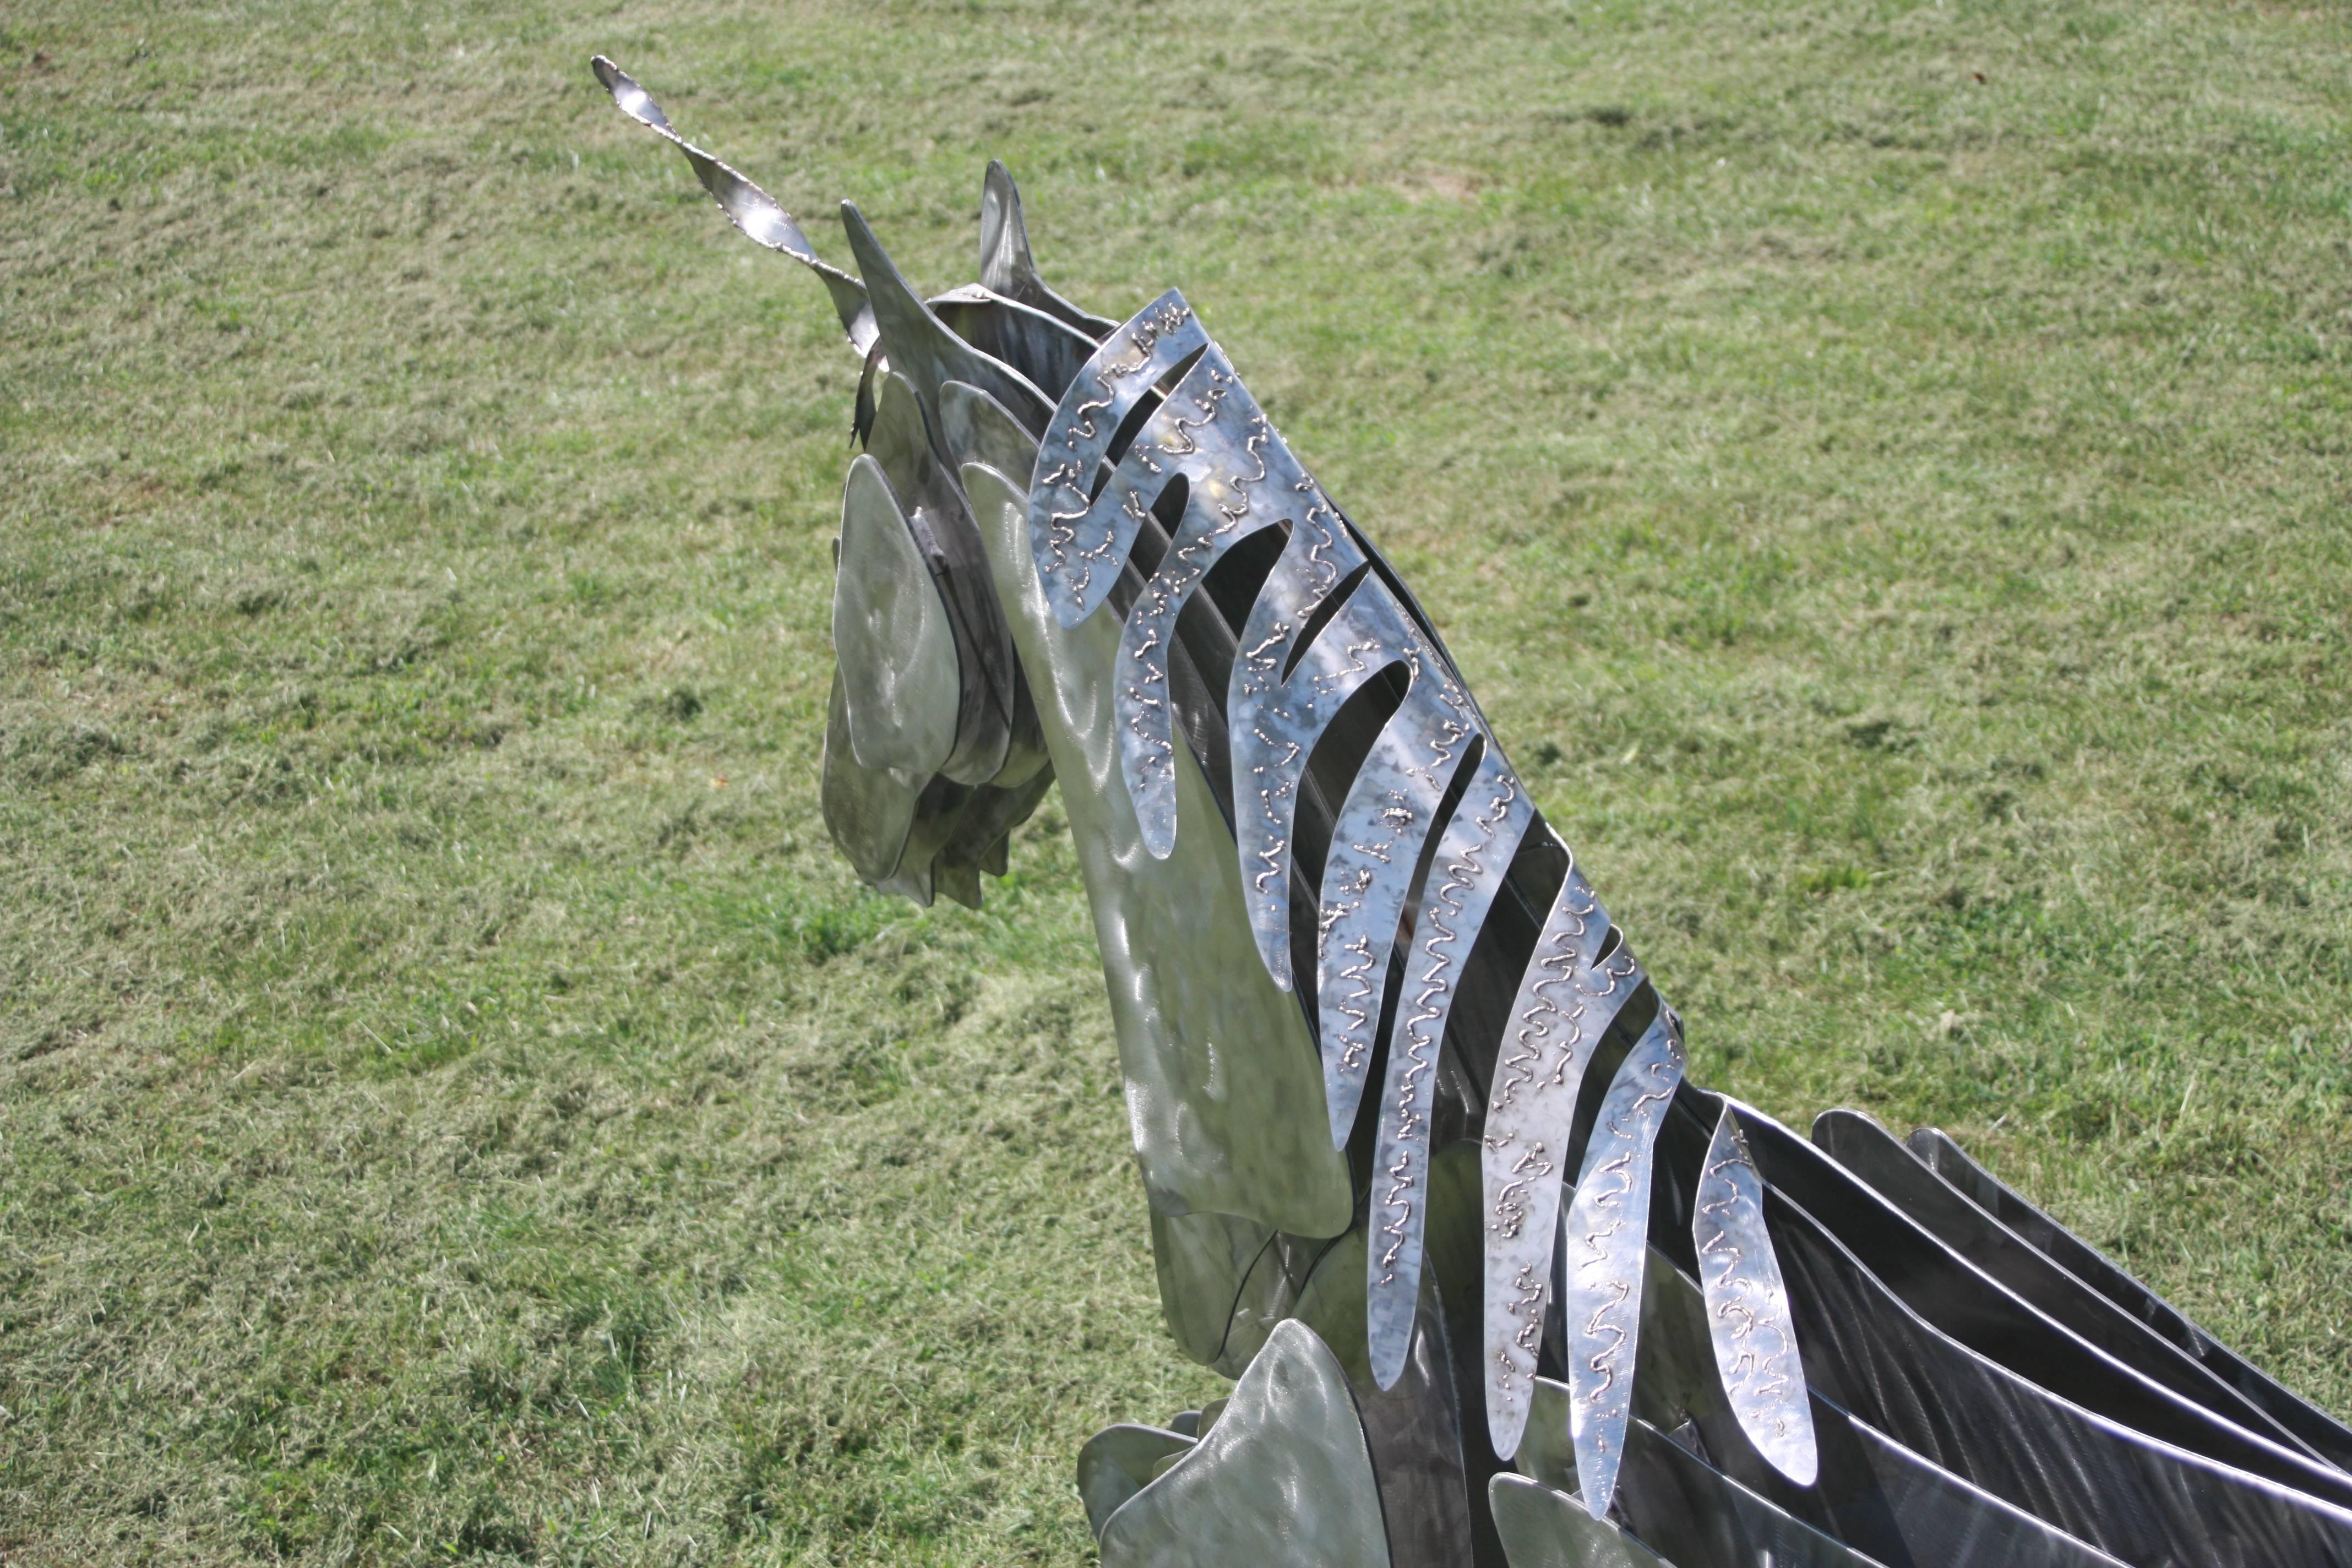 Stainless steel unicorn